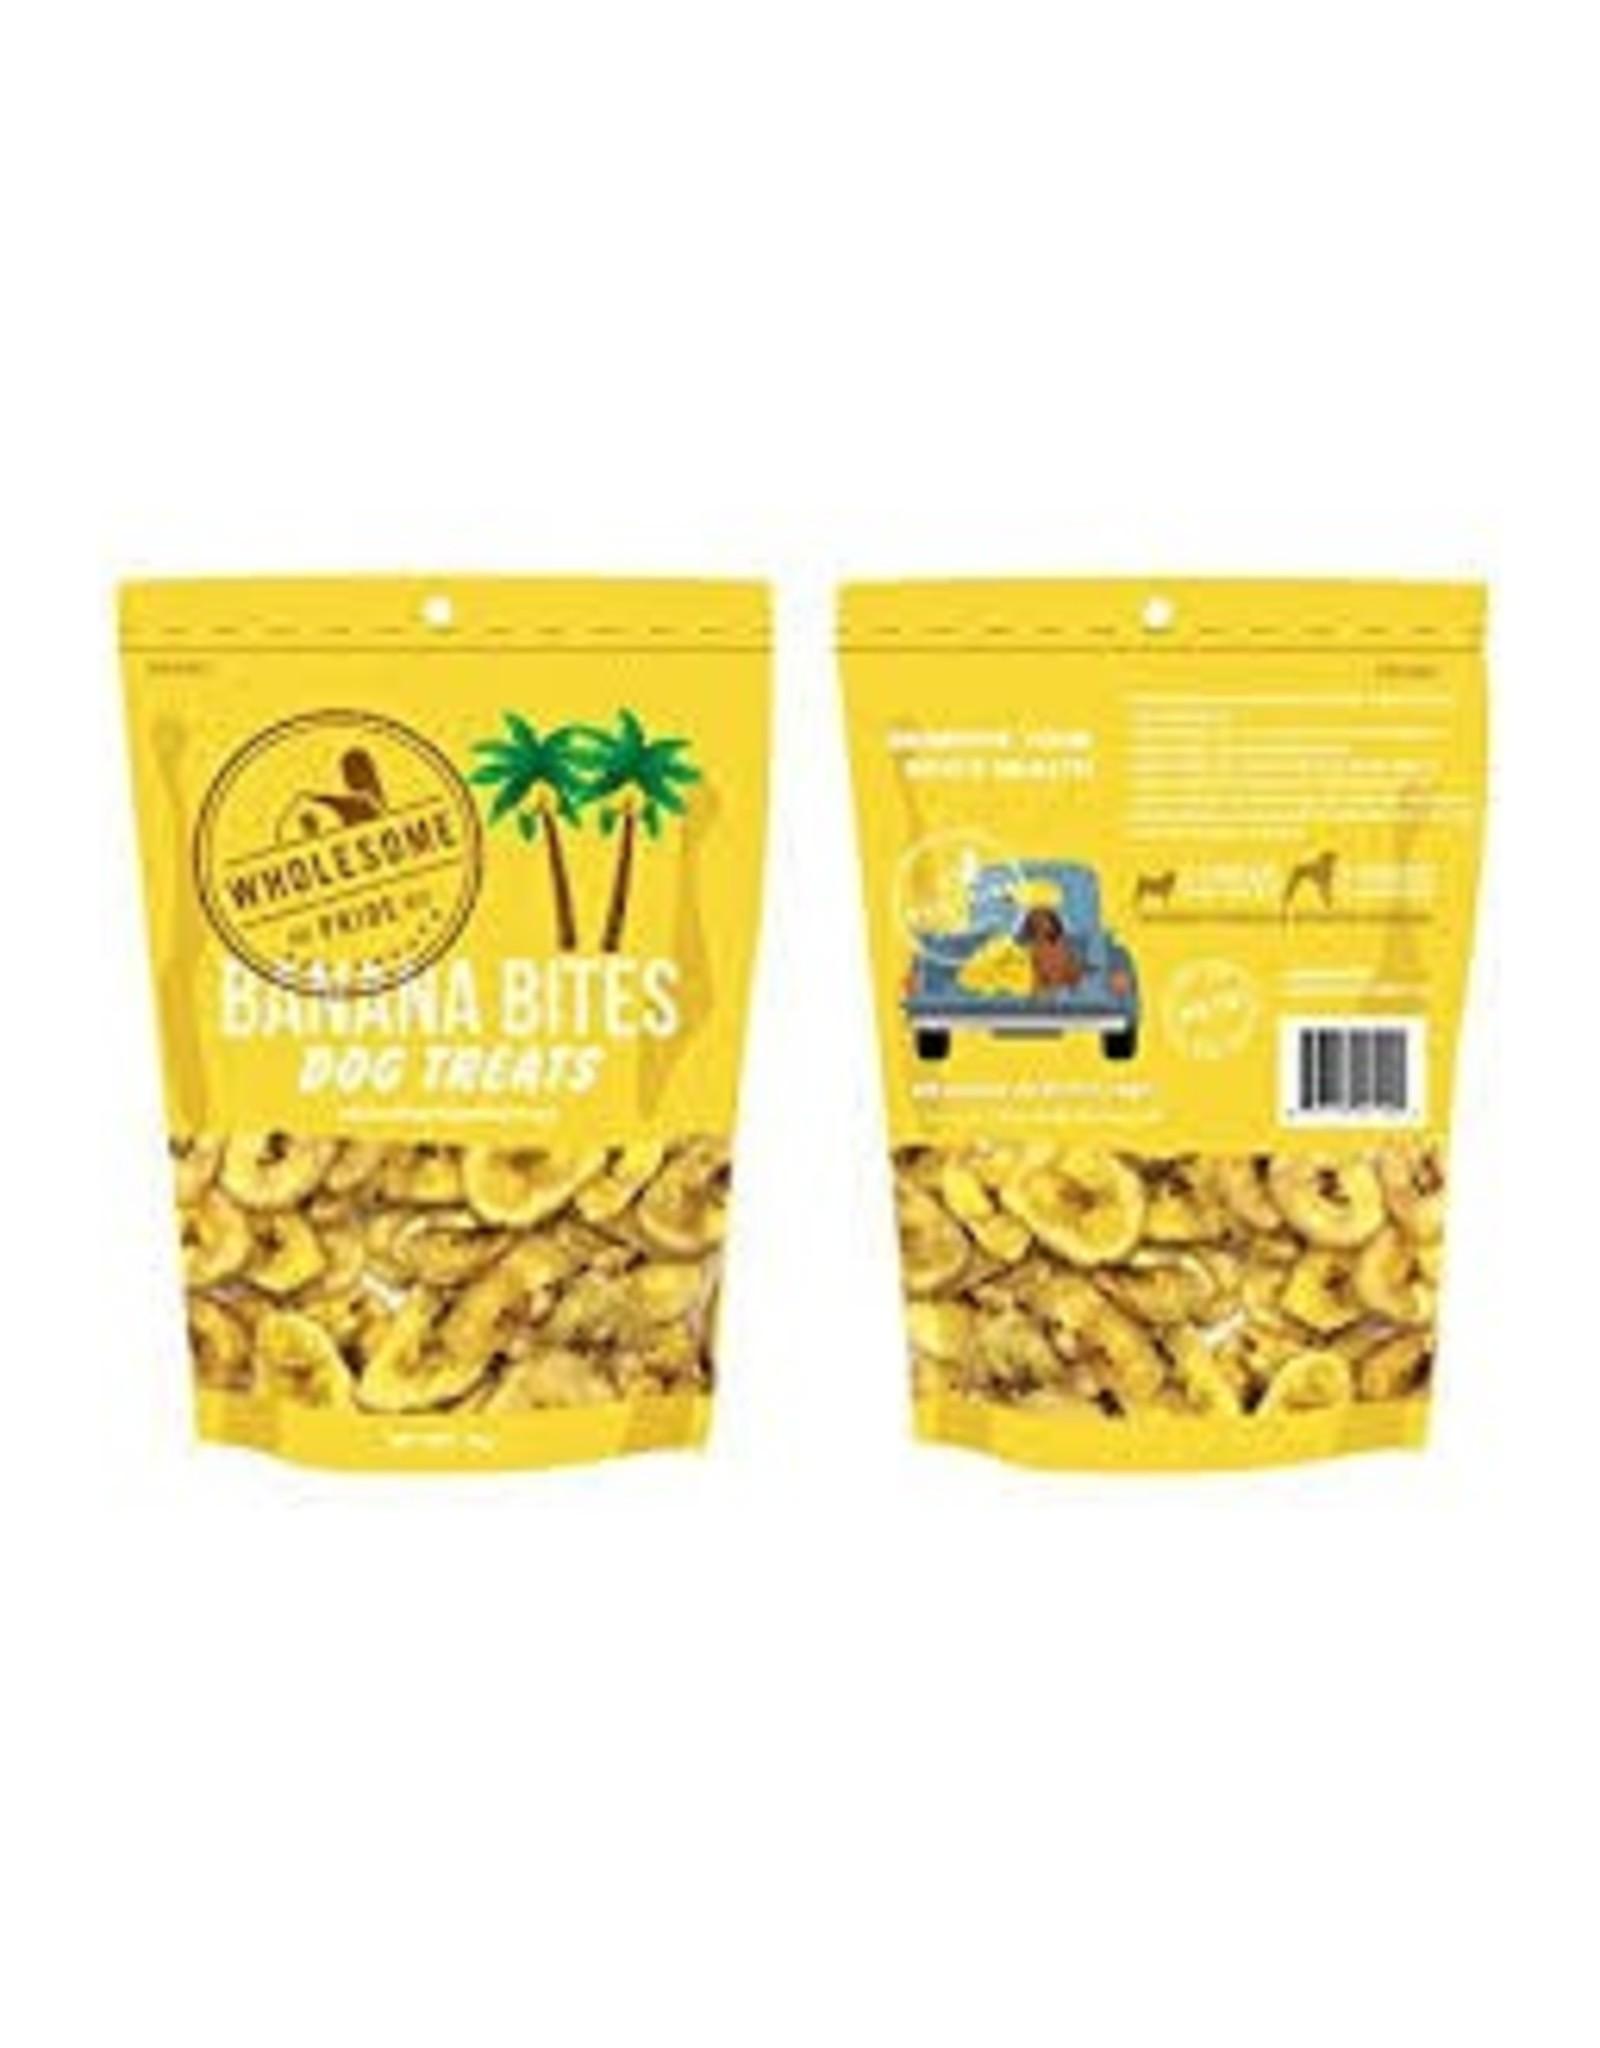 Wholesome Pride Banana Bites